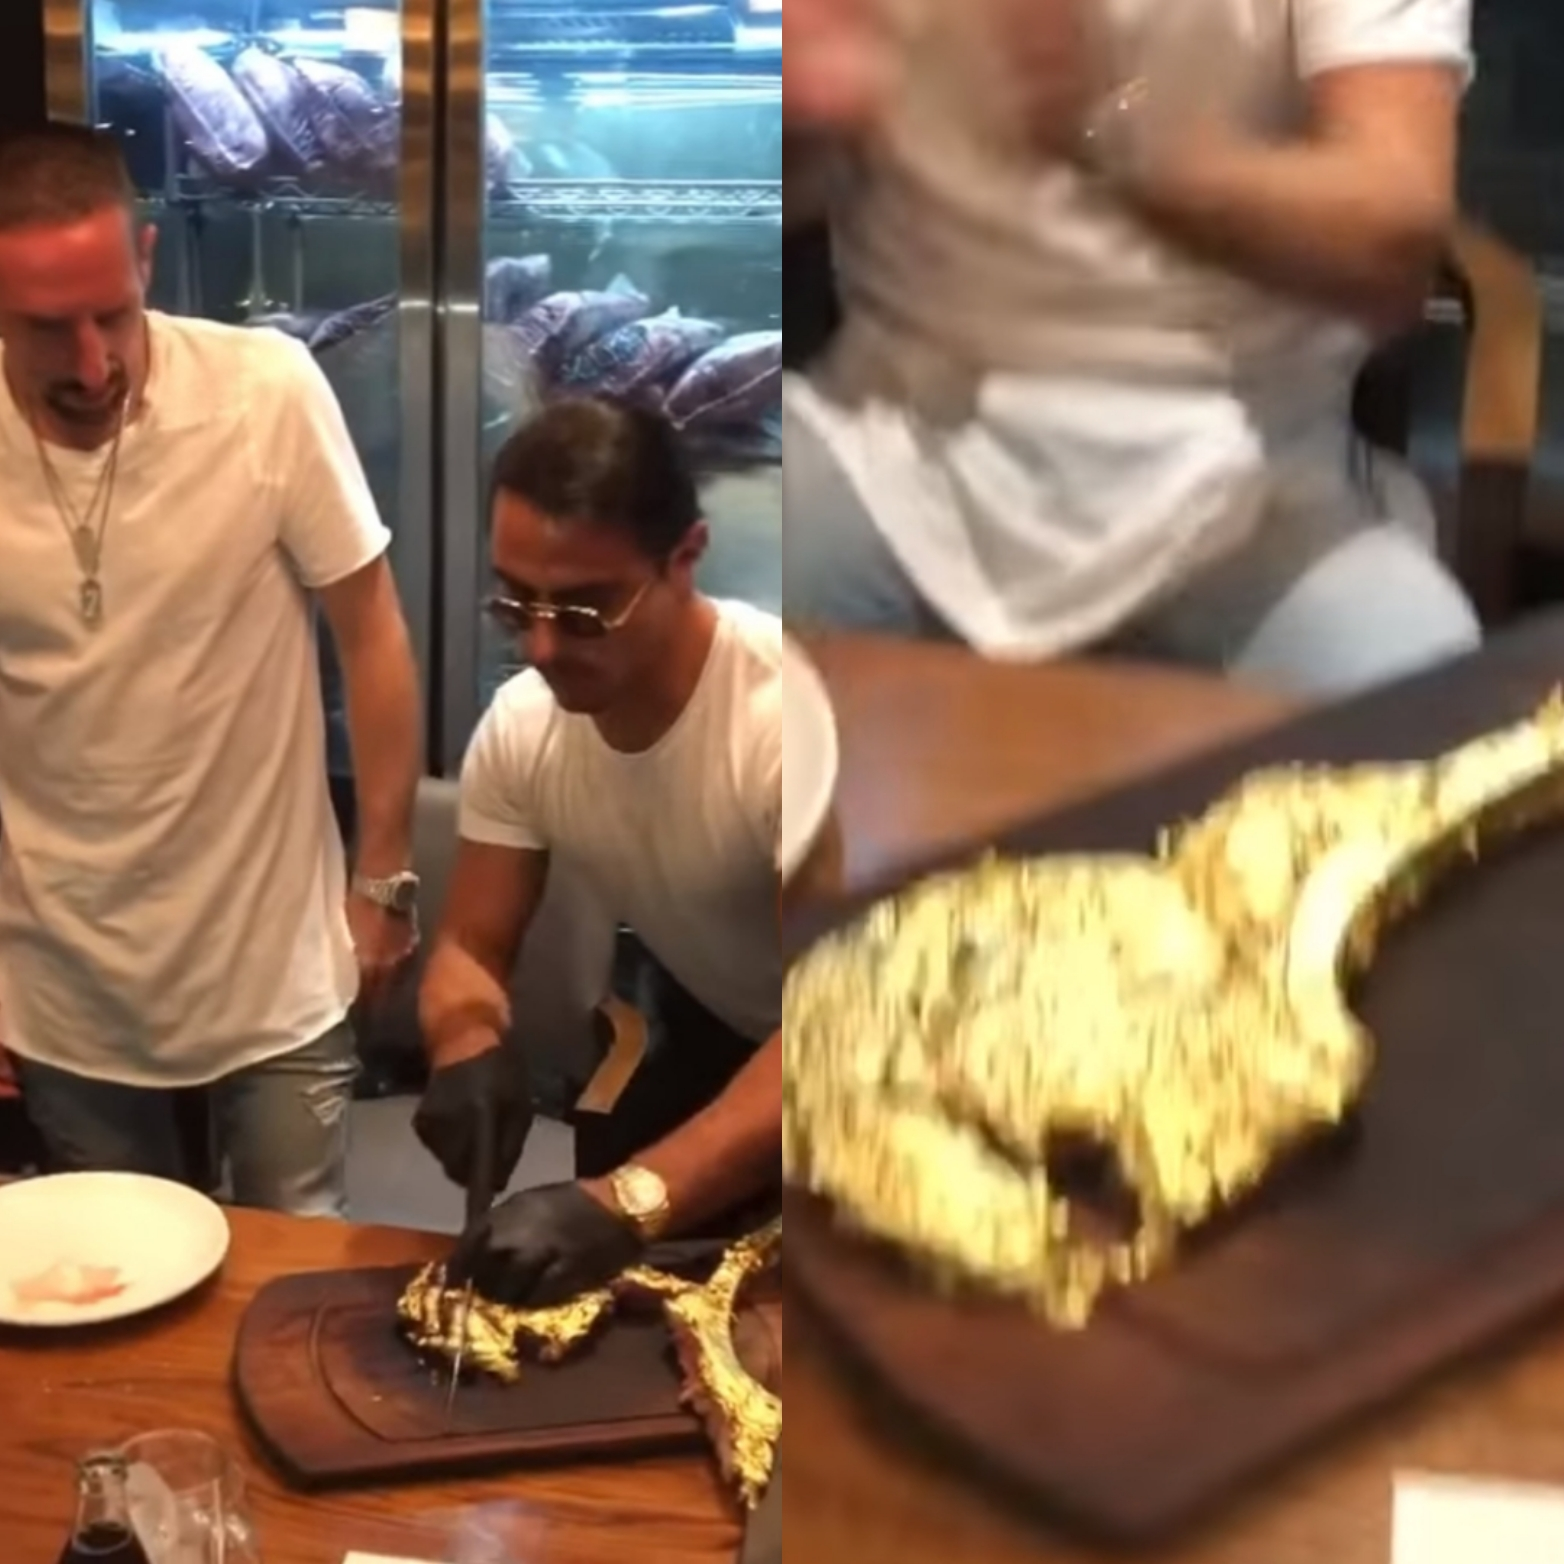 Vergoldetes Steak